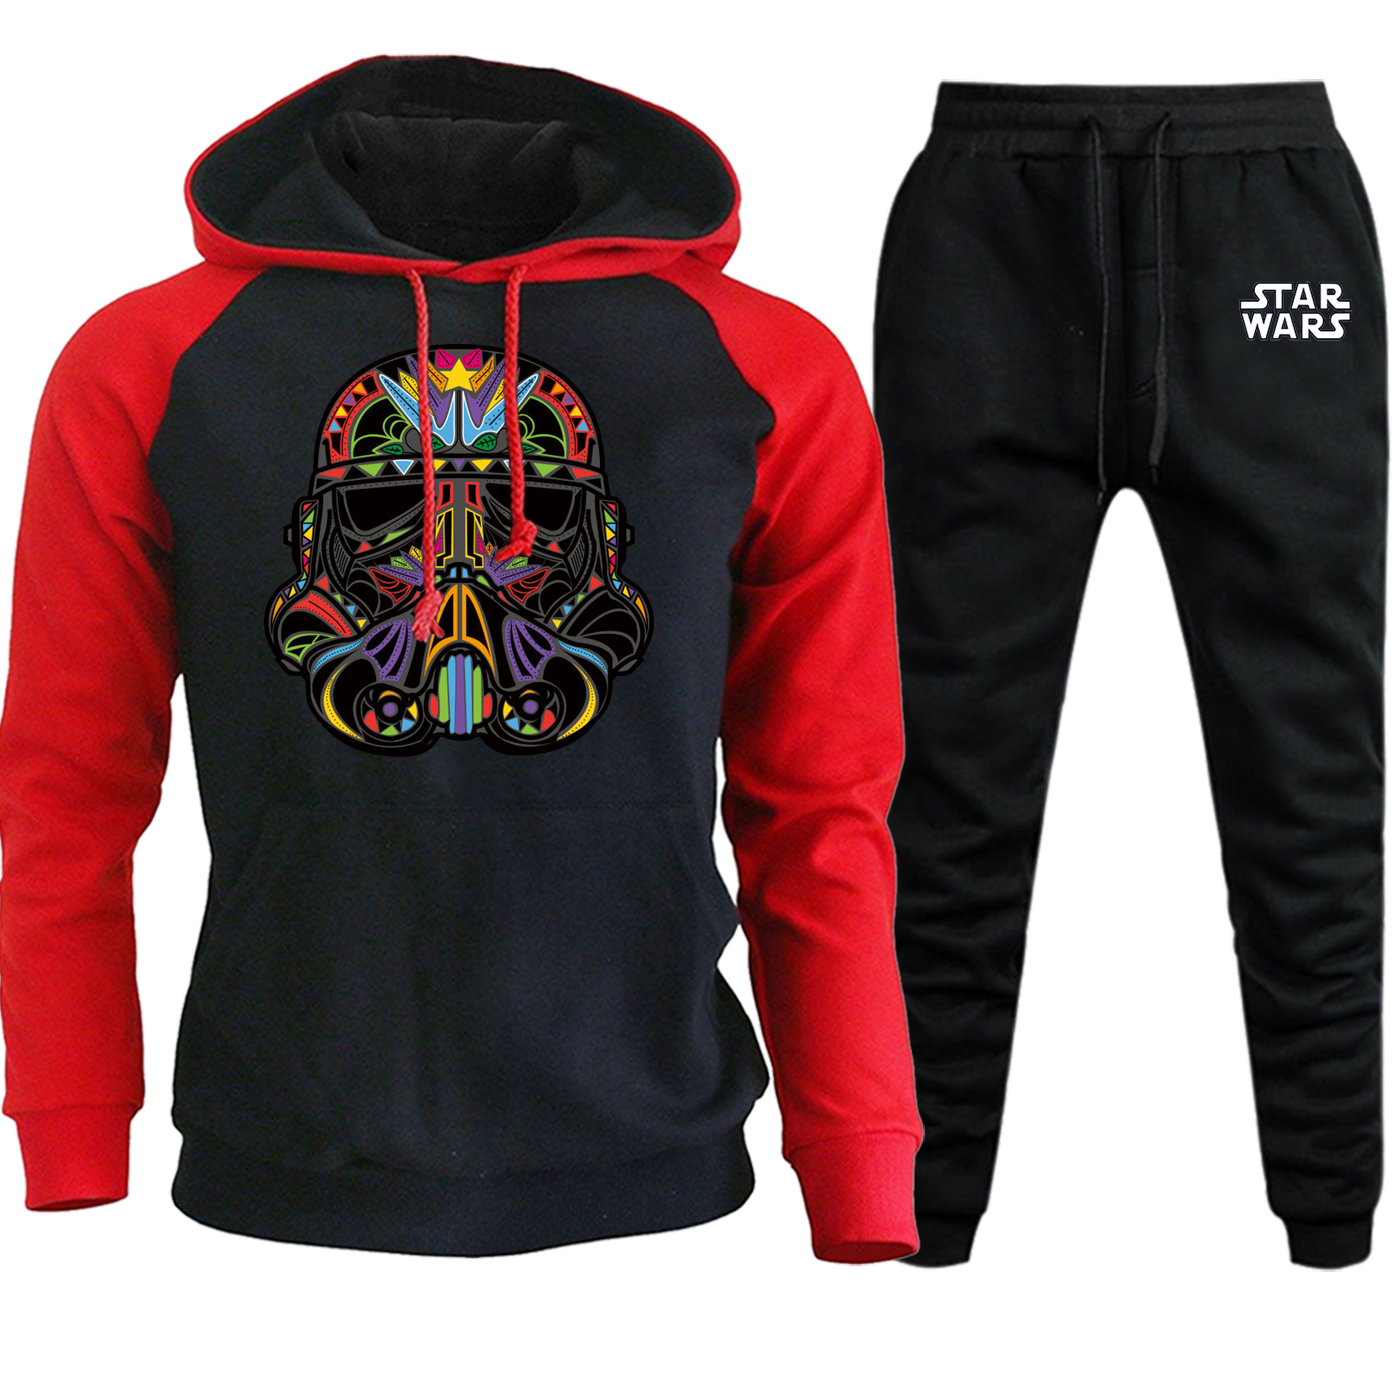 Autumn 2019 Hot Sale Star Wars Funny Stormtrooper Streetwear Men Raglan Hoodies Casual Pullover Suit Hooded+Pants 2 Piece Set